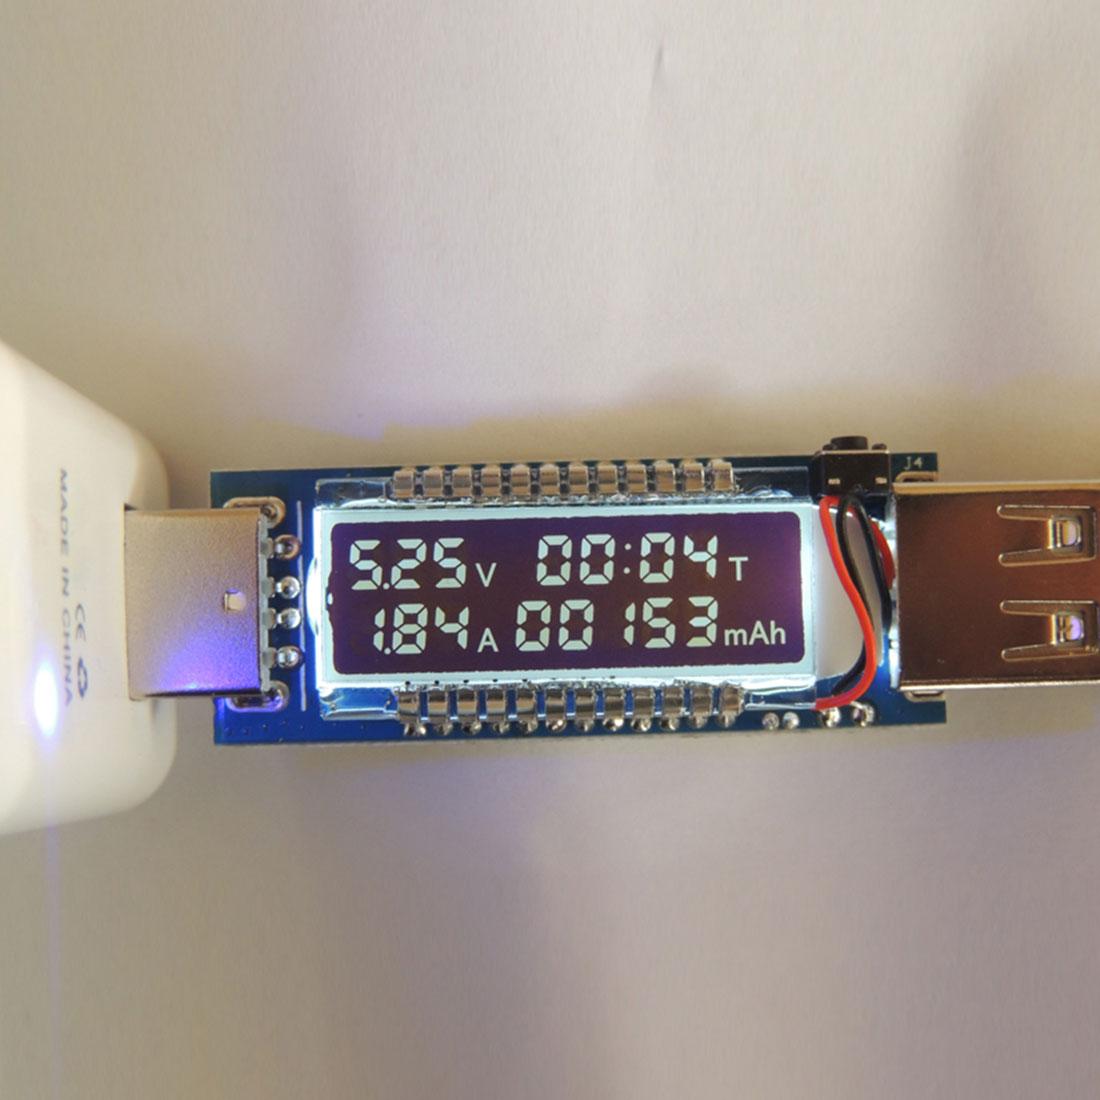 USB Charger Doctor Medical Power Detector Test Of battery Current Voltage Tester